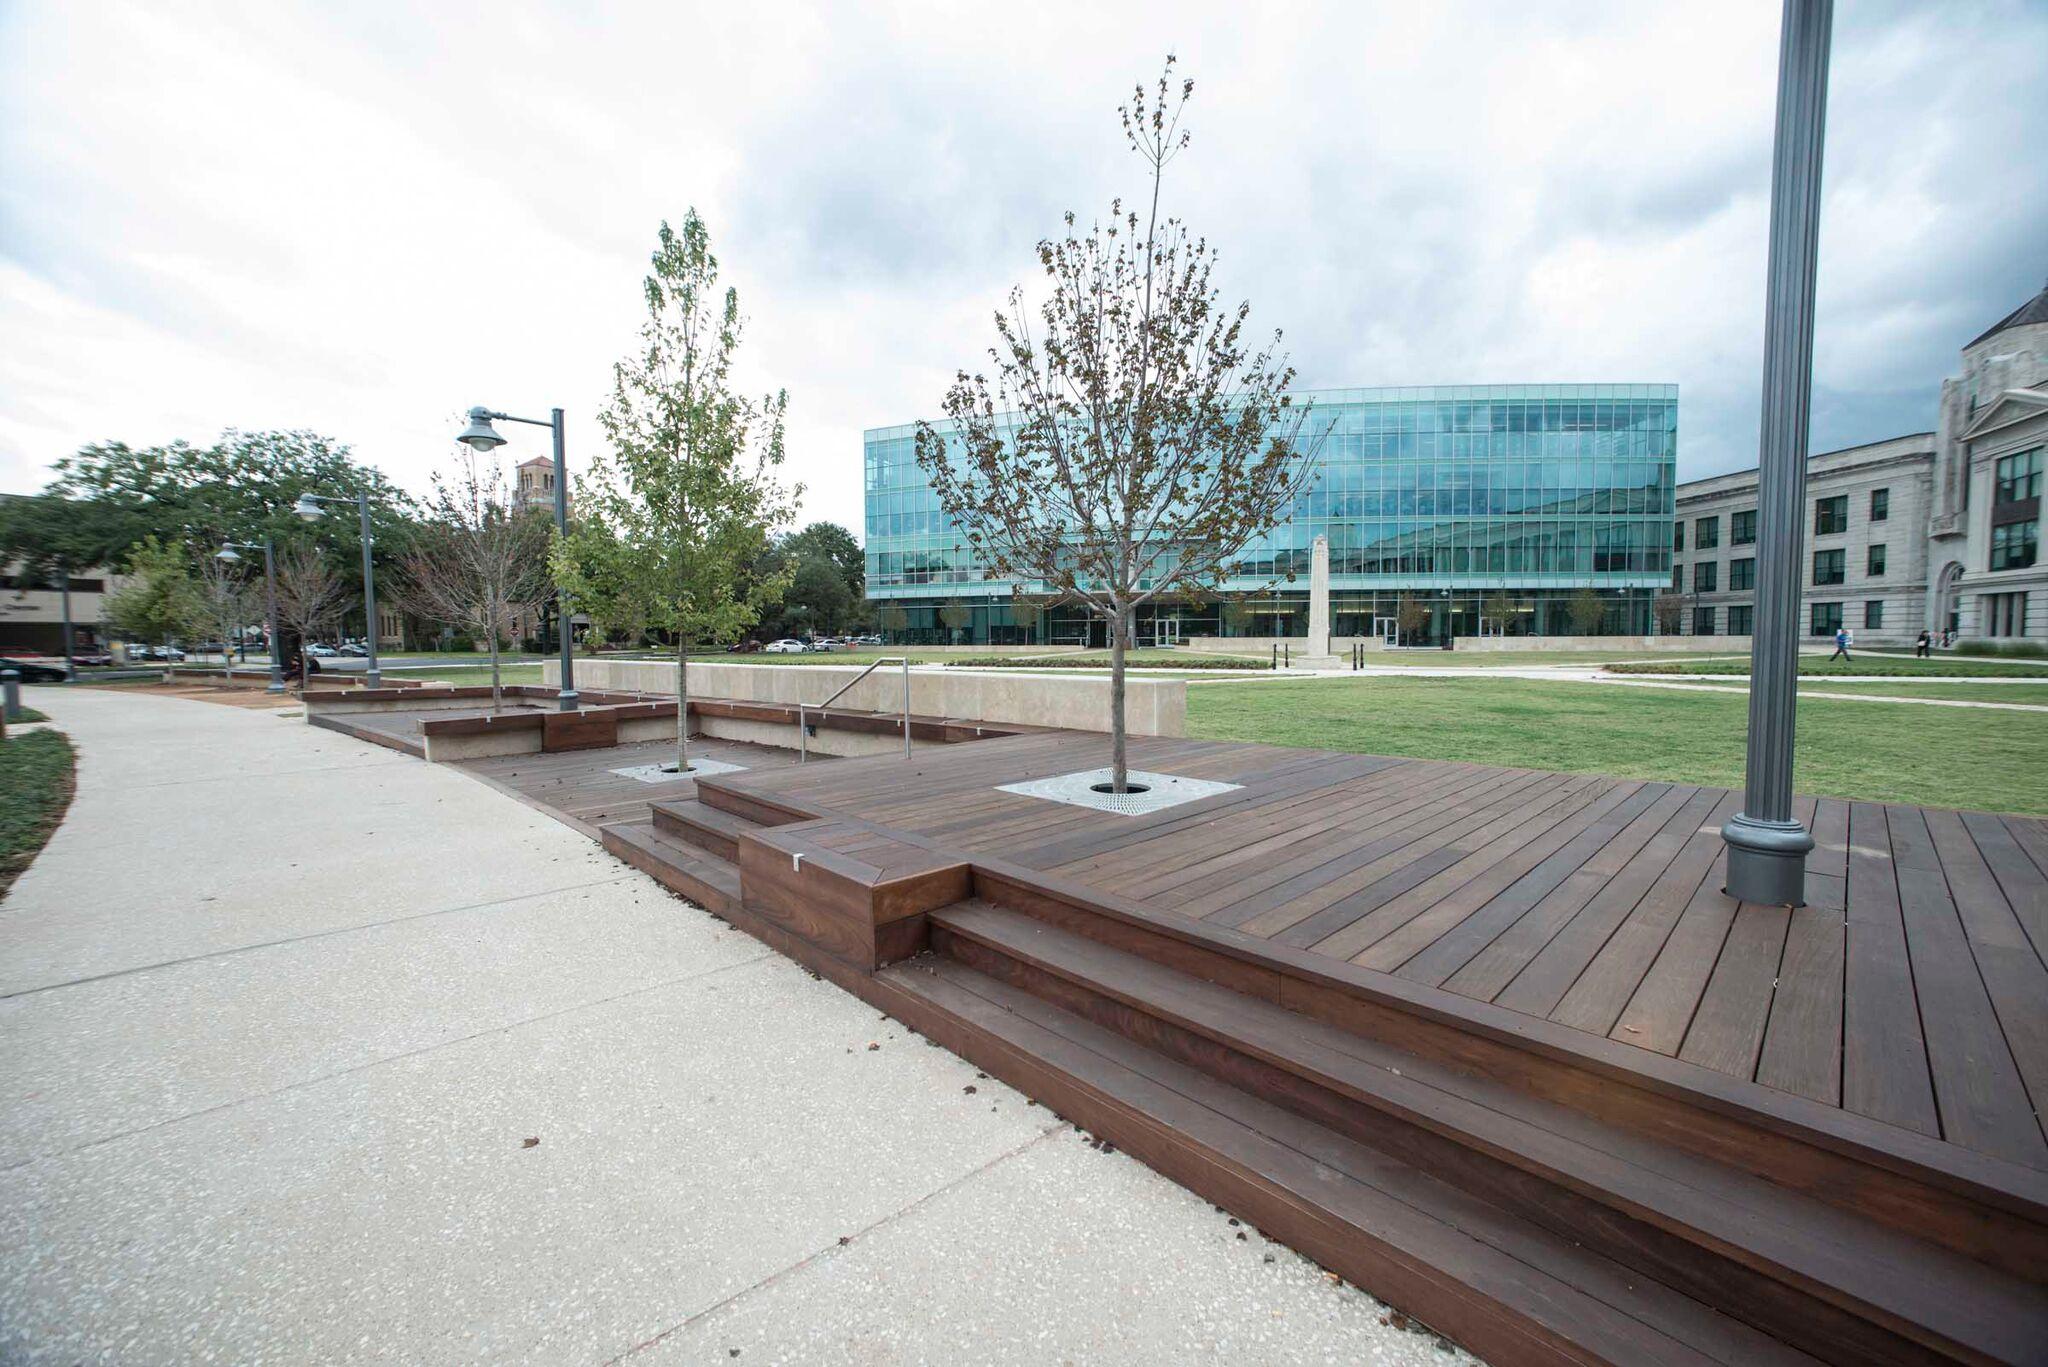 Houston Community College San Jacinto – Ipe Deck